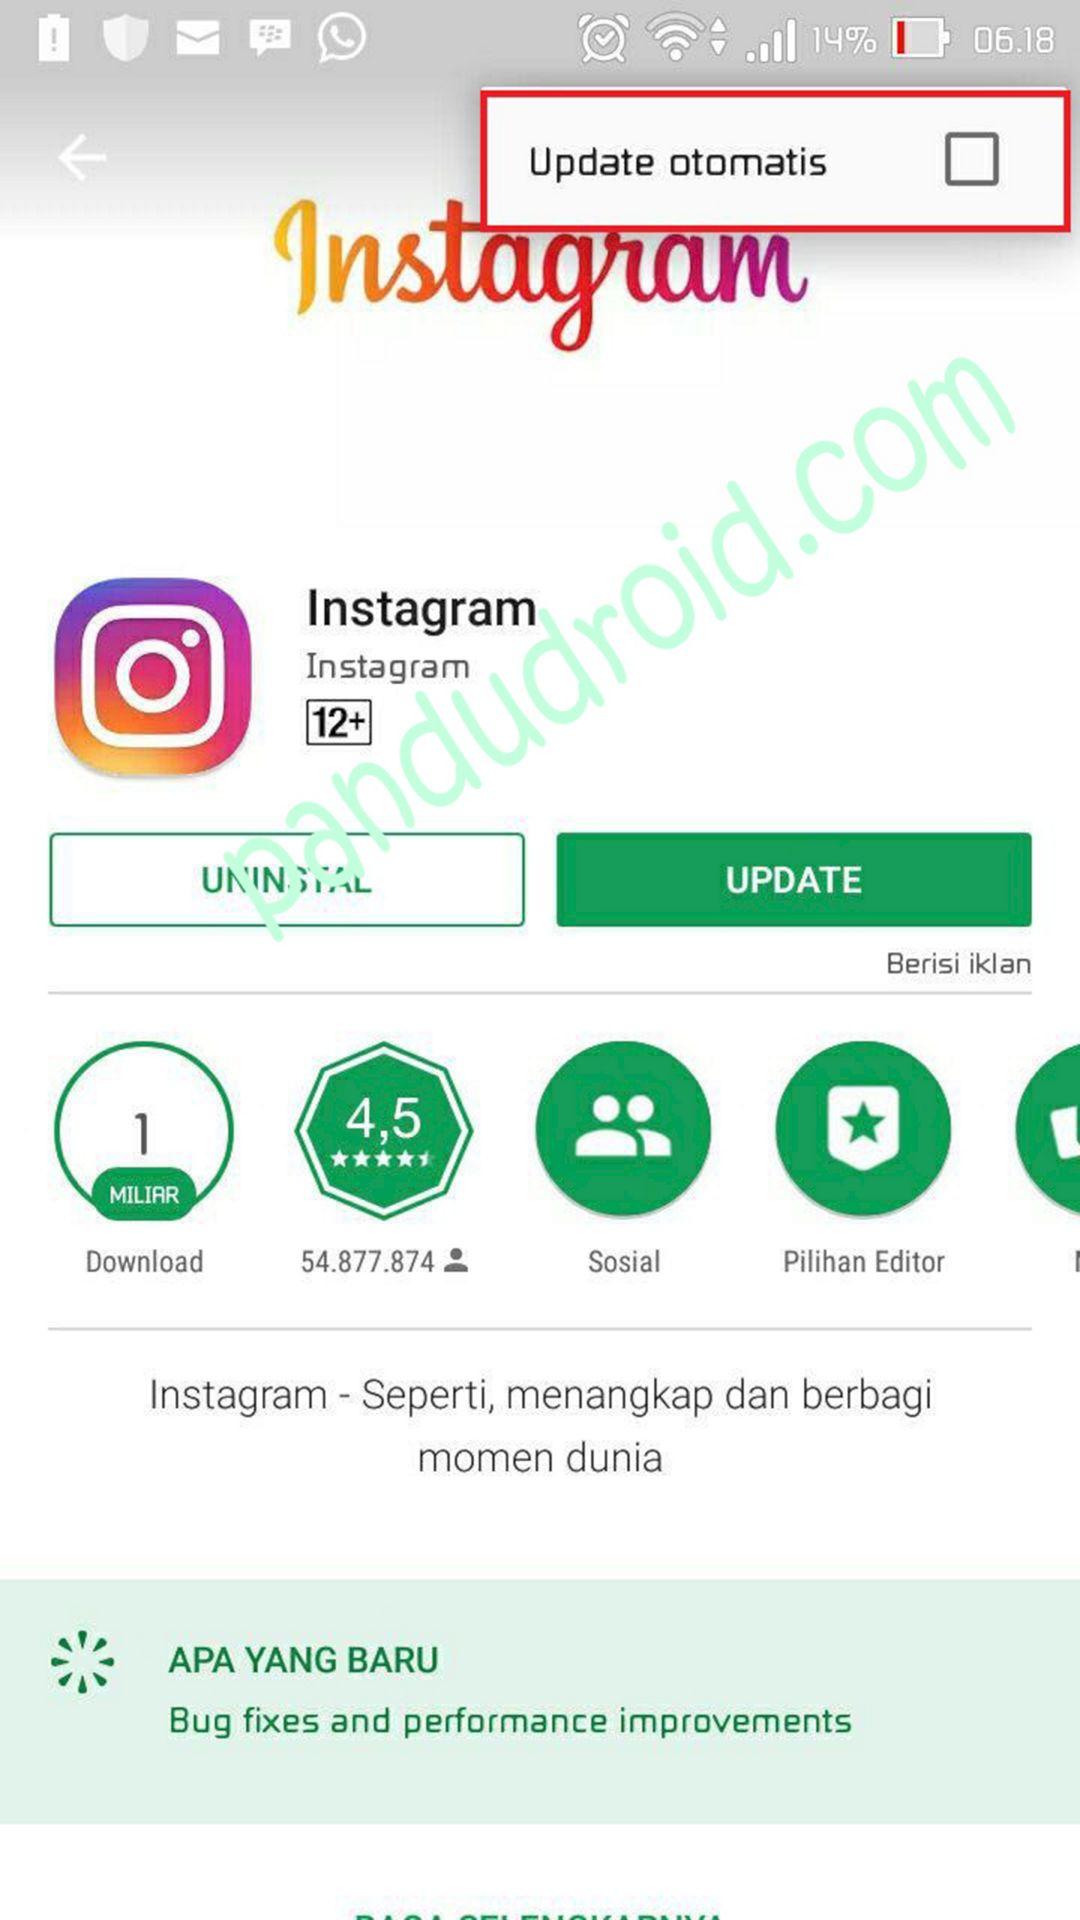 Learn how to change and set the app icon in android studio. Cara Mematikan Auto Update Pembaharuan Otomatis Aplikasi Pada Android Tip Trik Panduan Android Indonesia